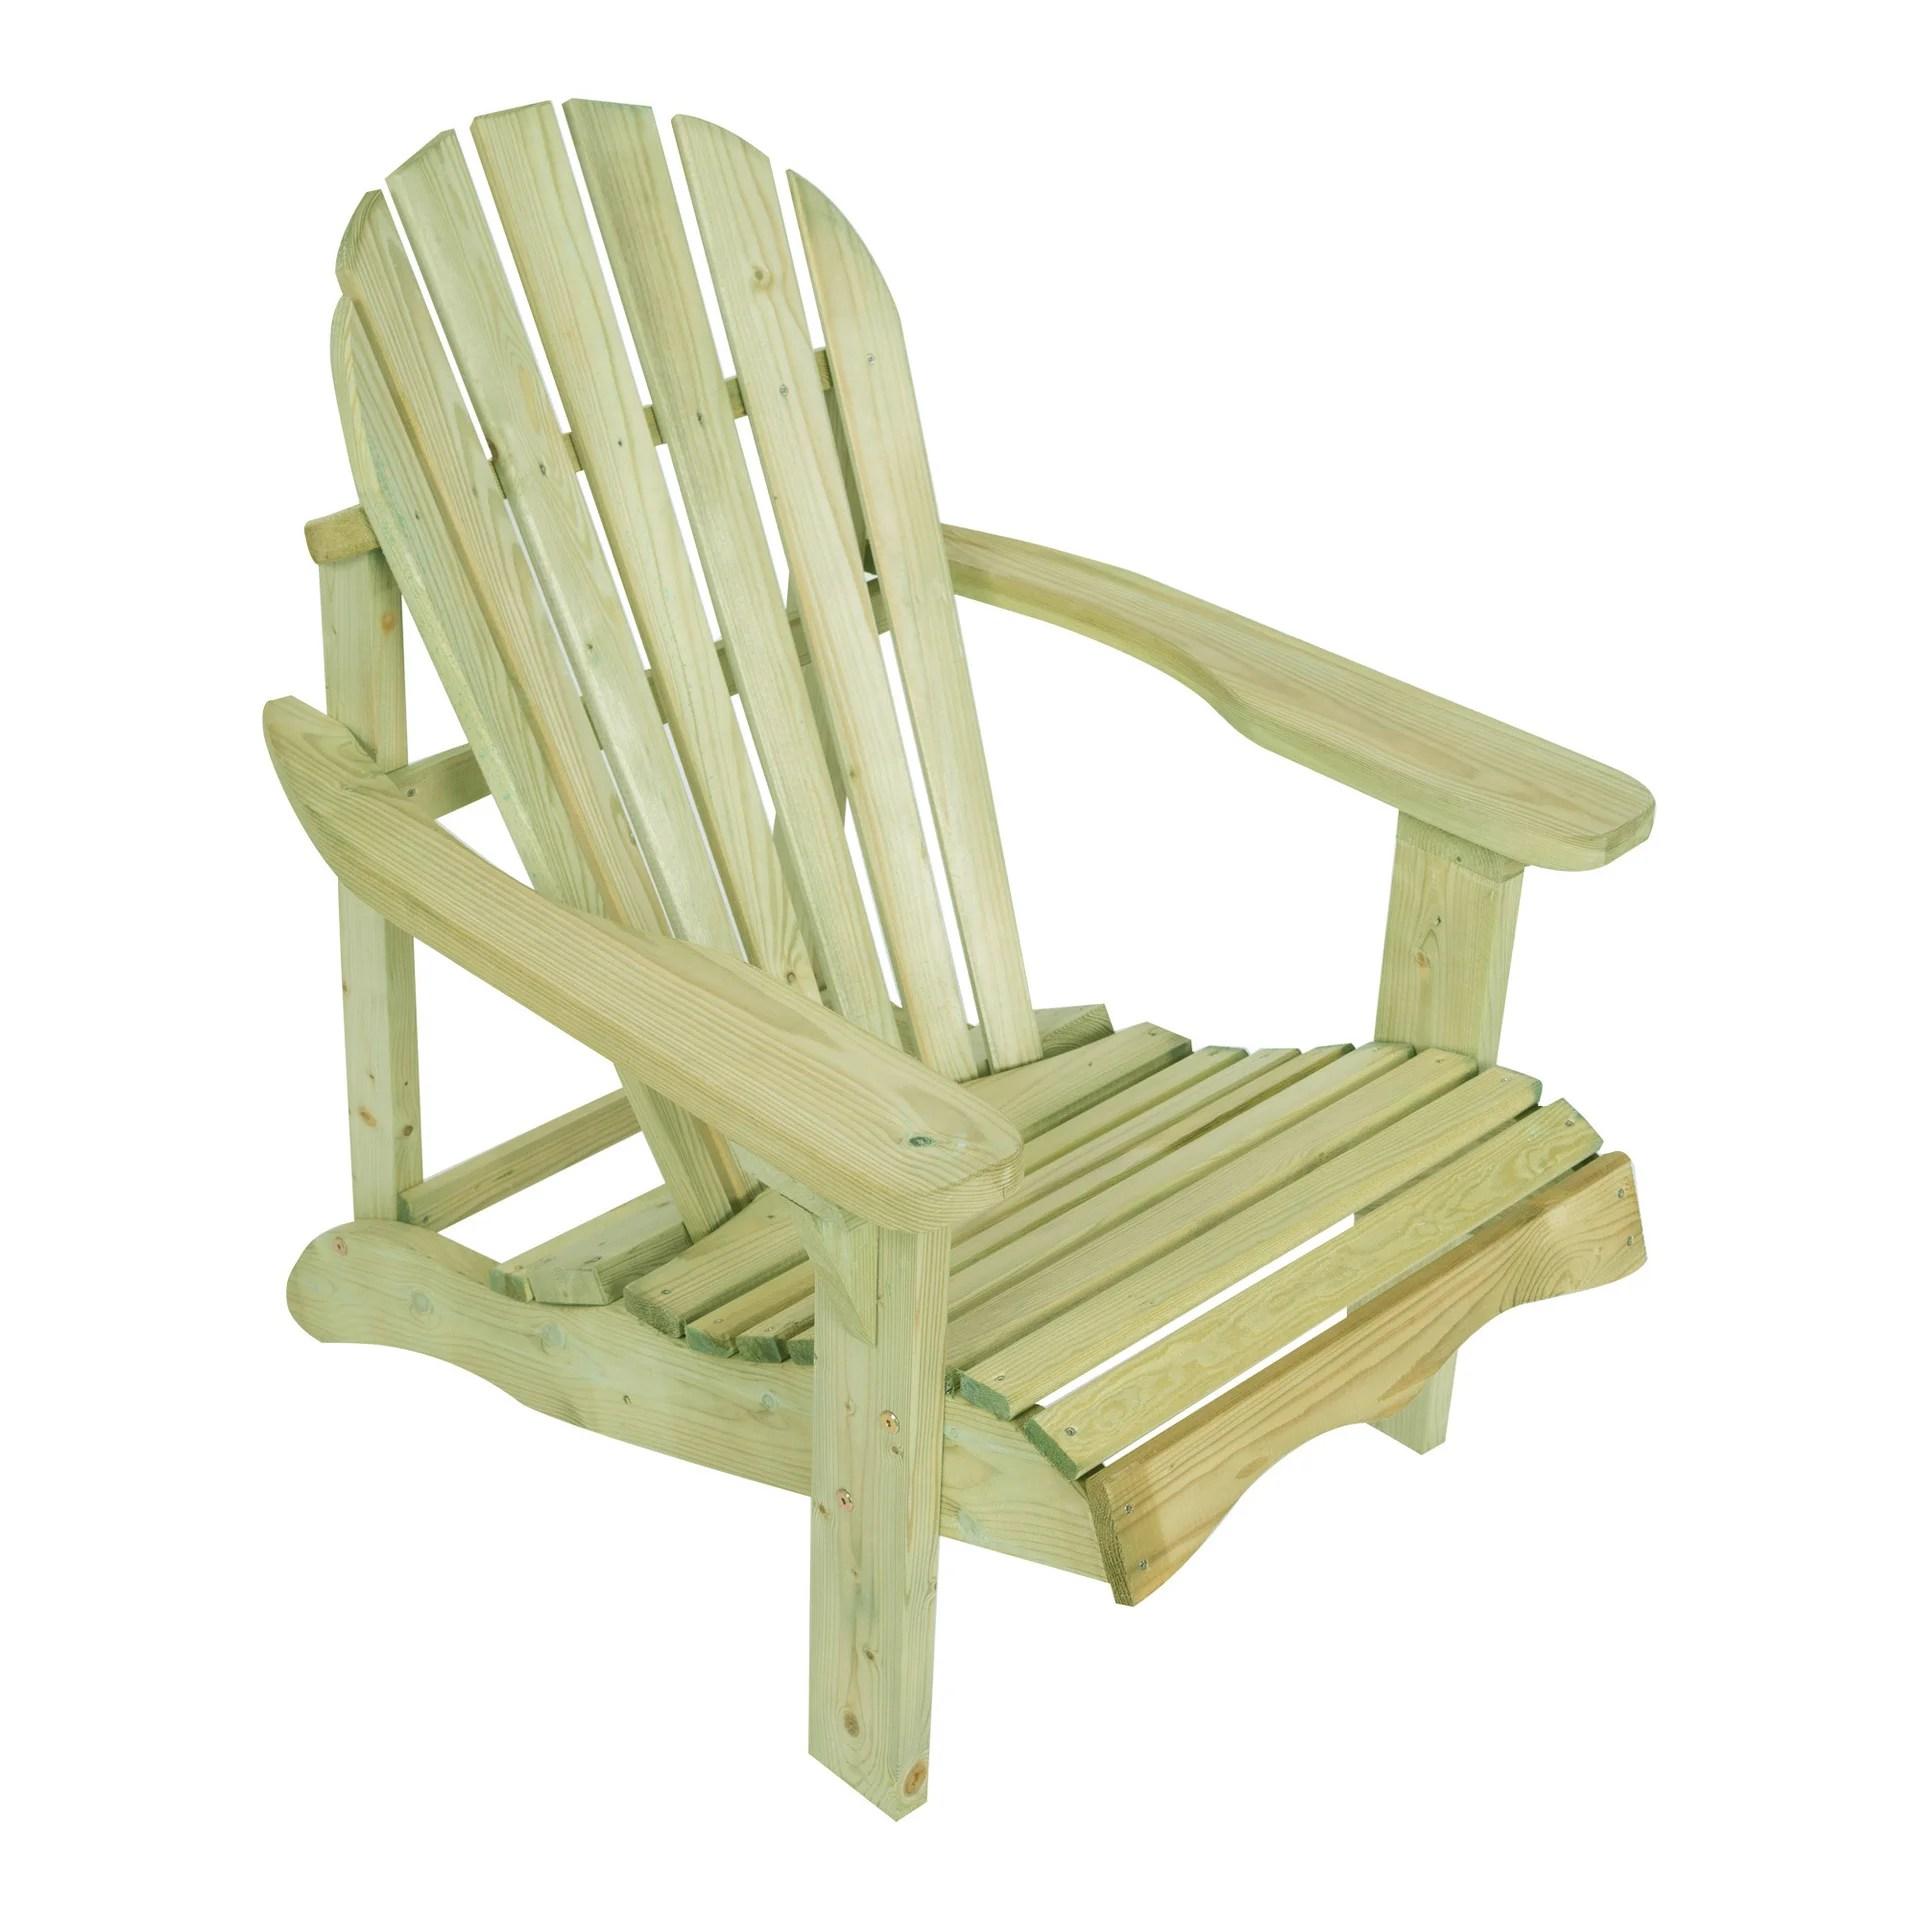 fauteuil de jardin en bois 253160 01lm naturelle leroy merlin